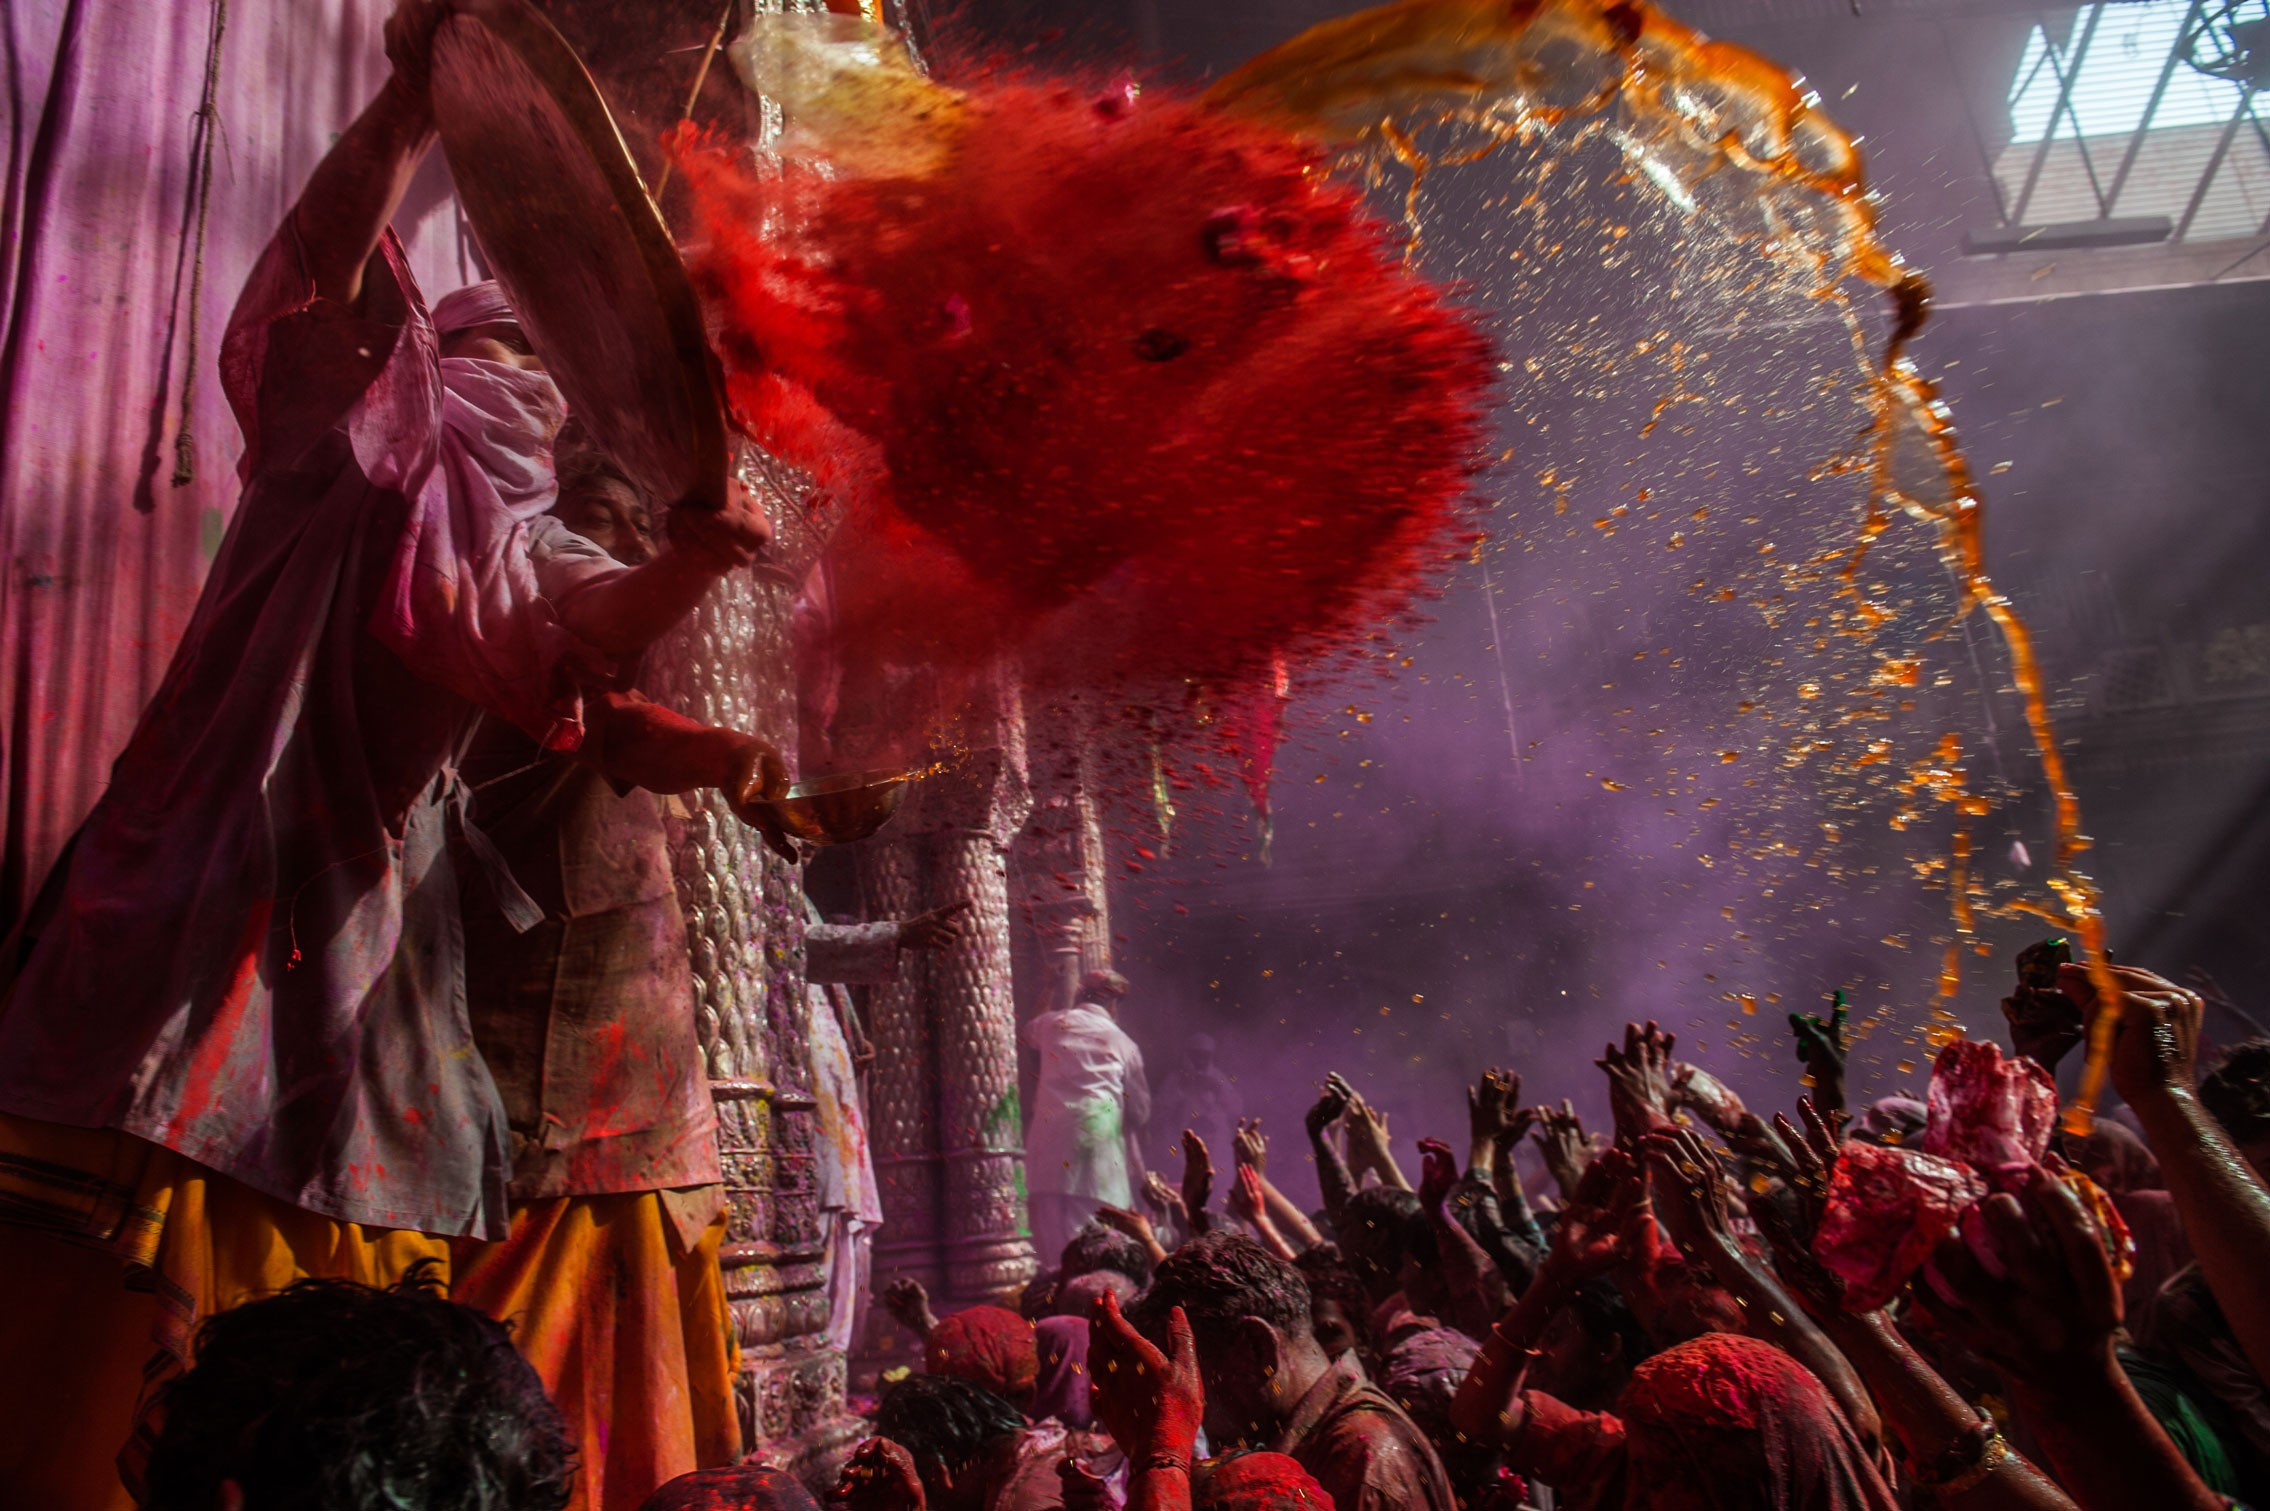 A Hindu priest throws coloured powder at devotees during Holi festival at the Banke Bihari